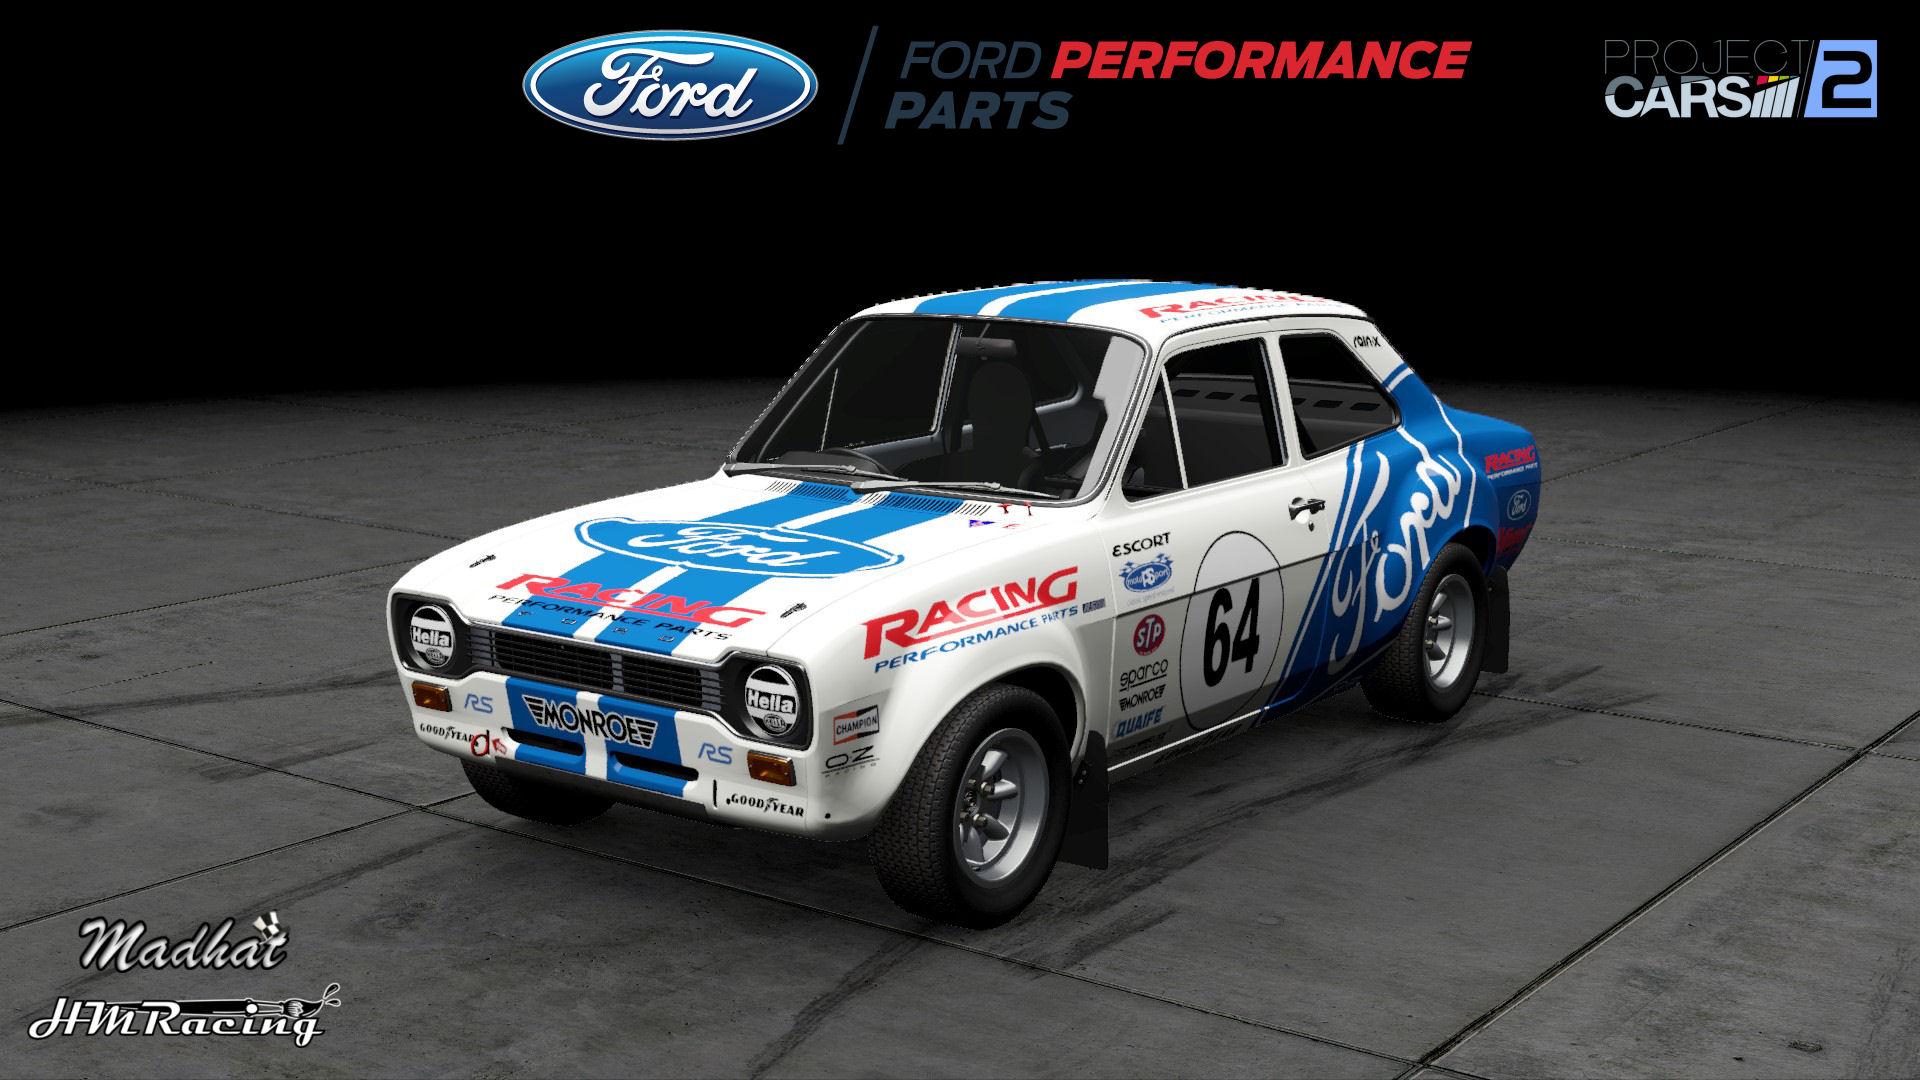 Ford Escort mk1 rx Racing Performance Parts 01.jpg